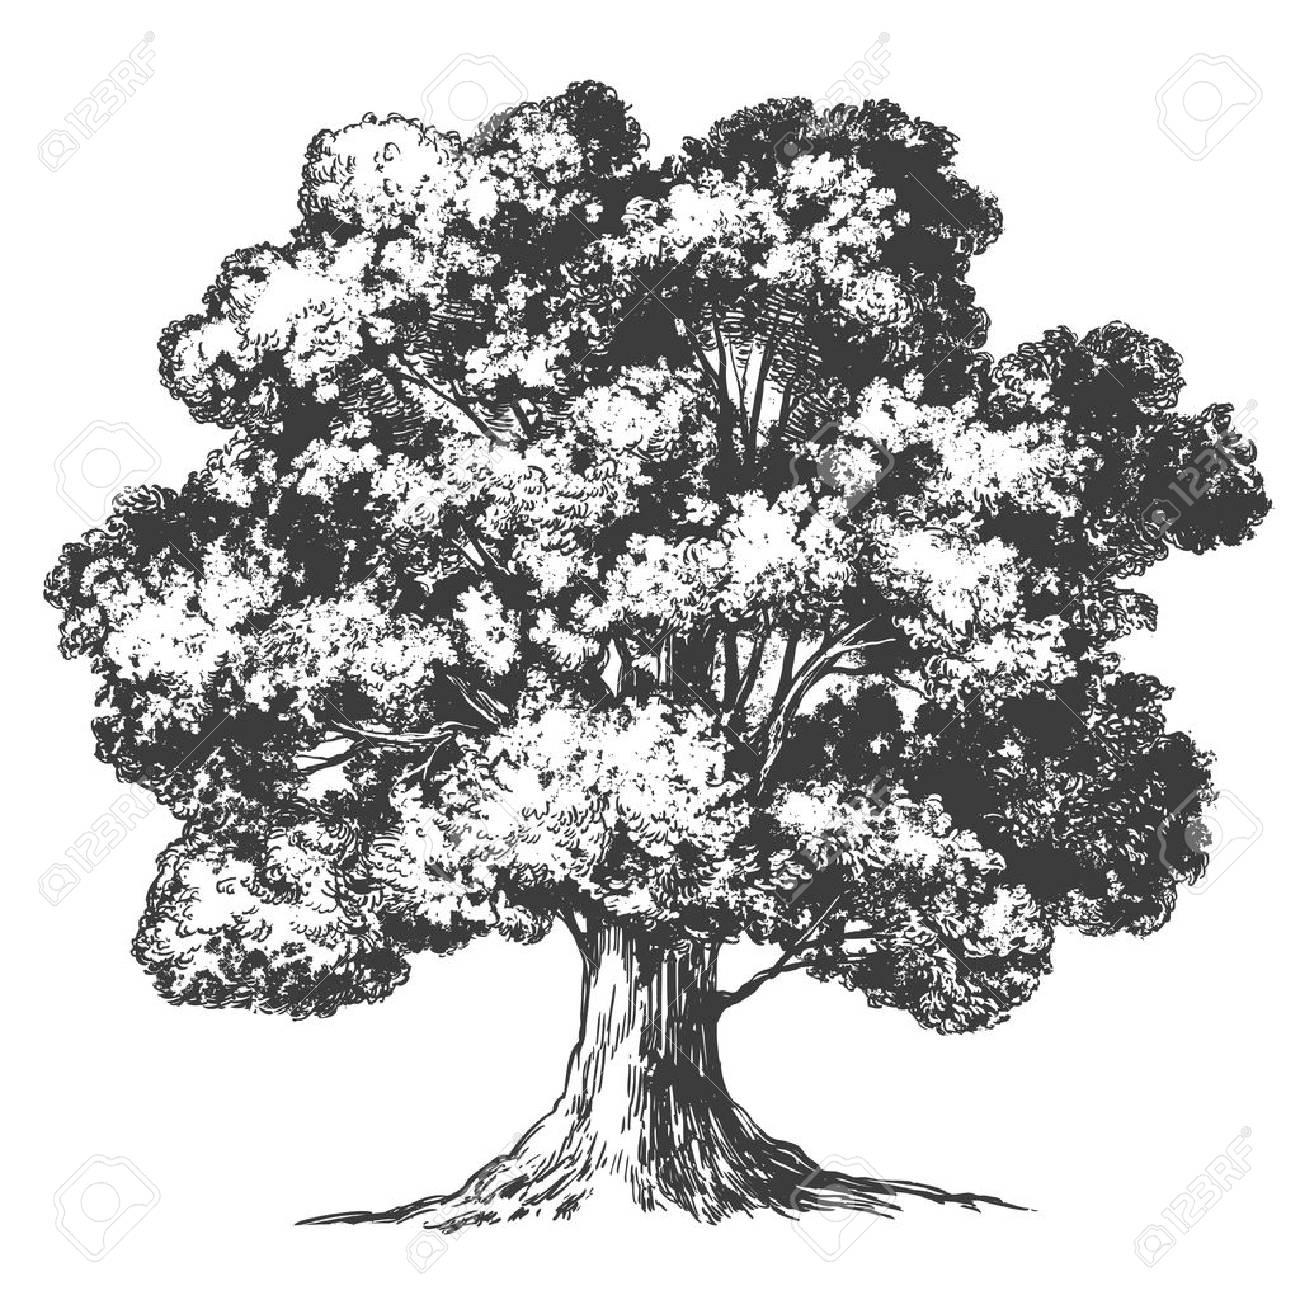 Tree hand drawn vector illustration realistic sketch - 97502894